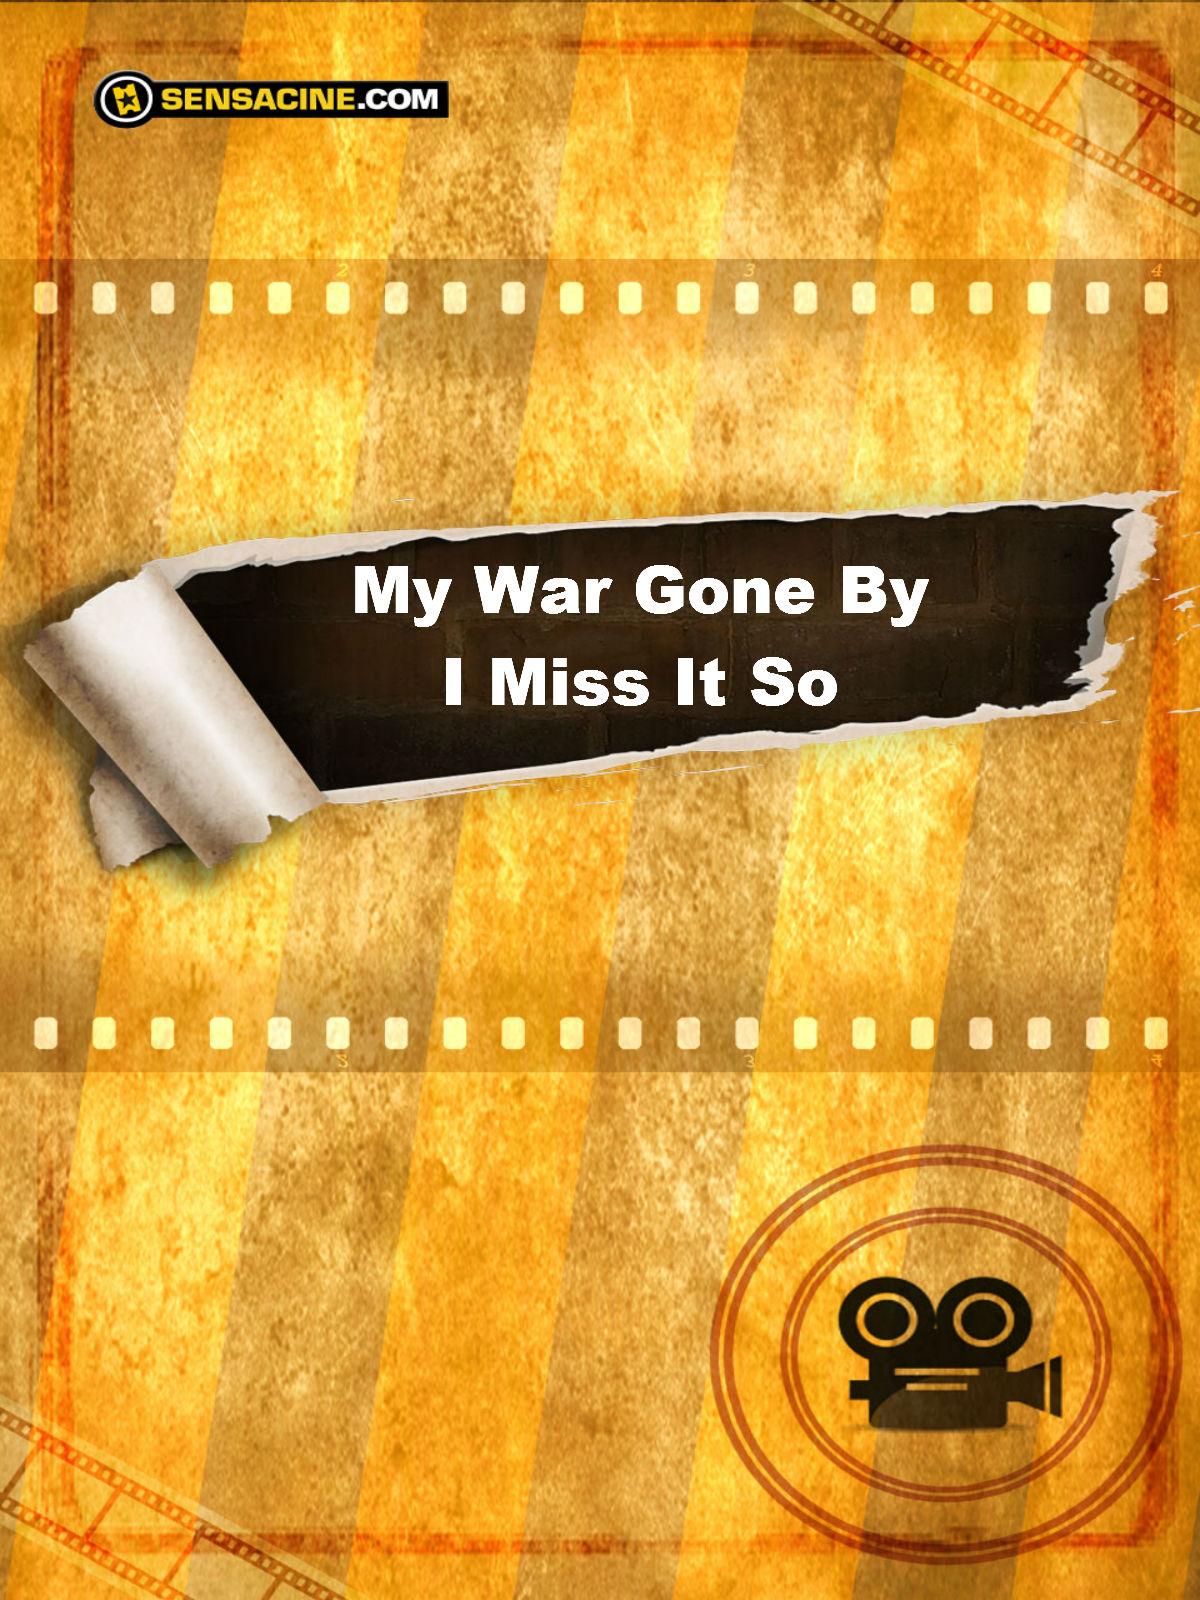 Télécharger My War Gone By, I Miss It So Gratuit HD